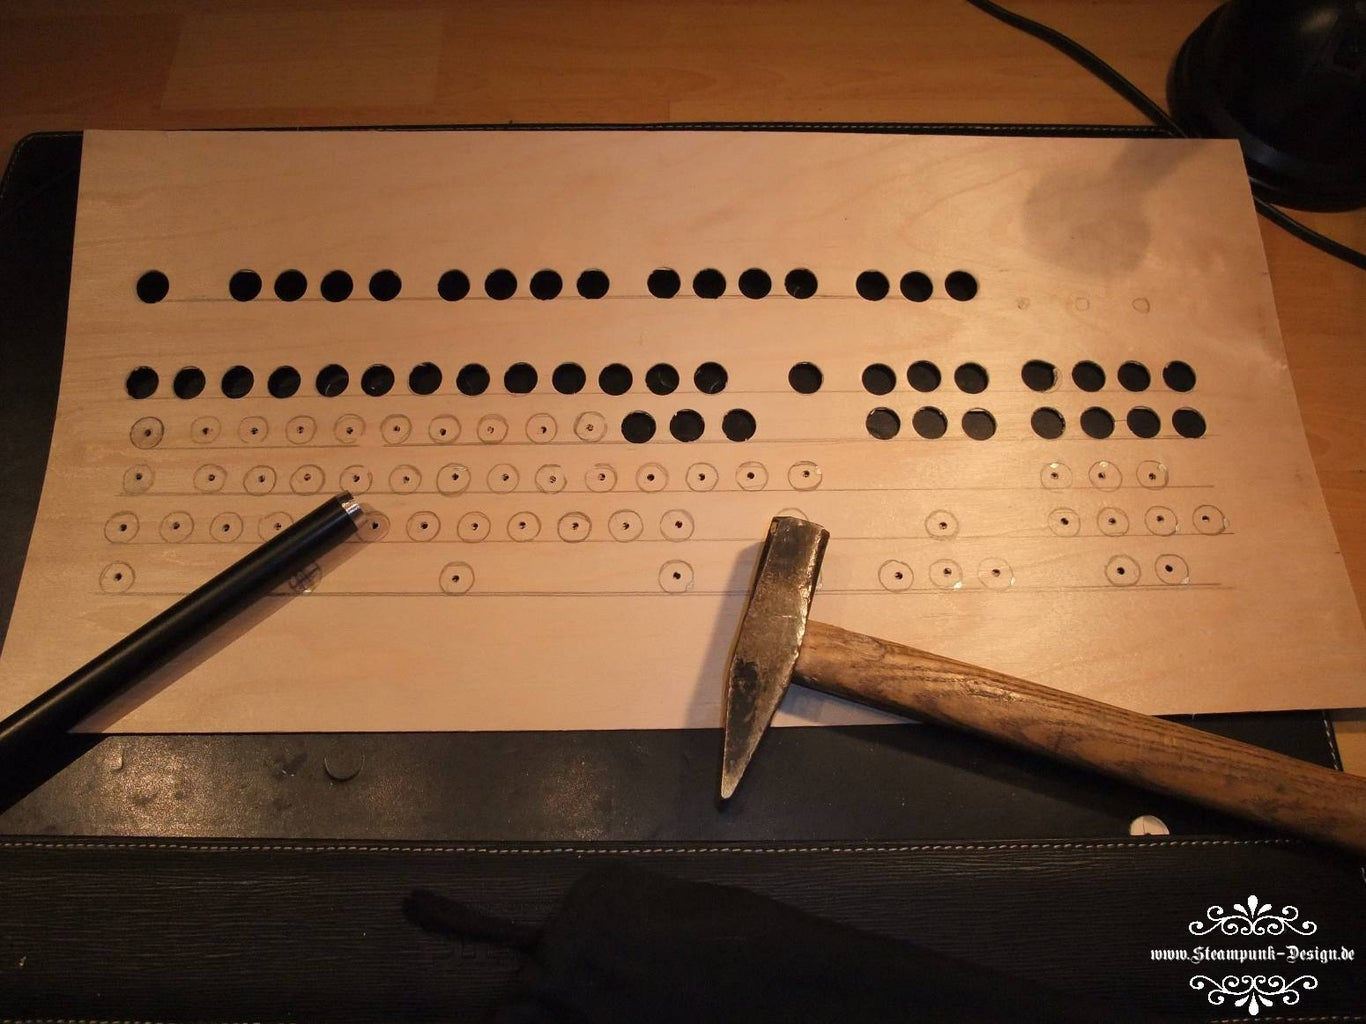 The Wood Inlay